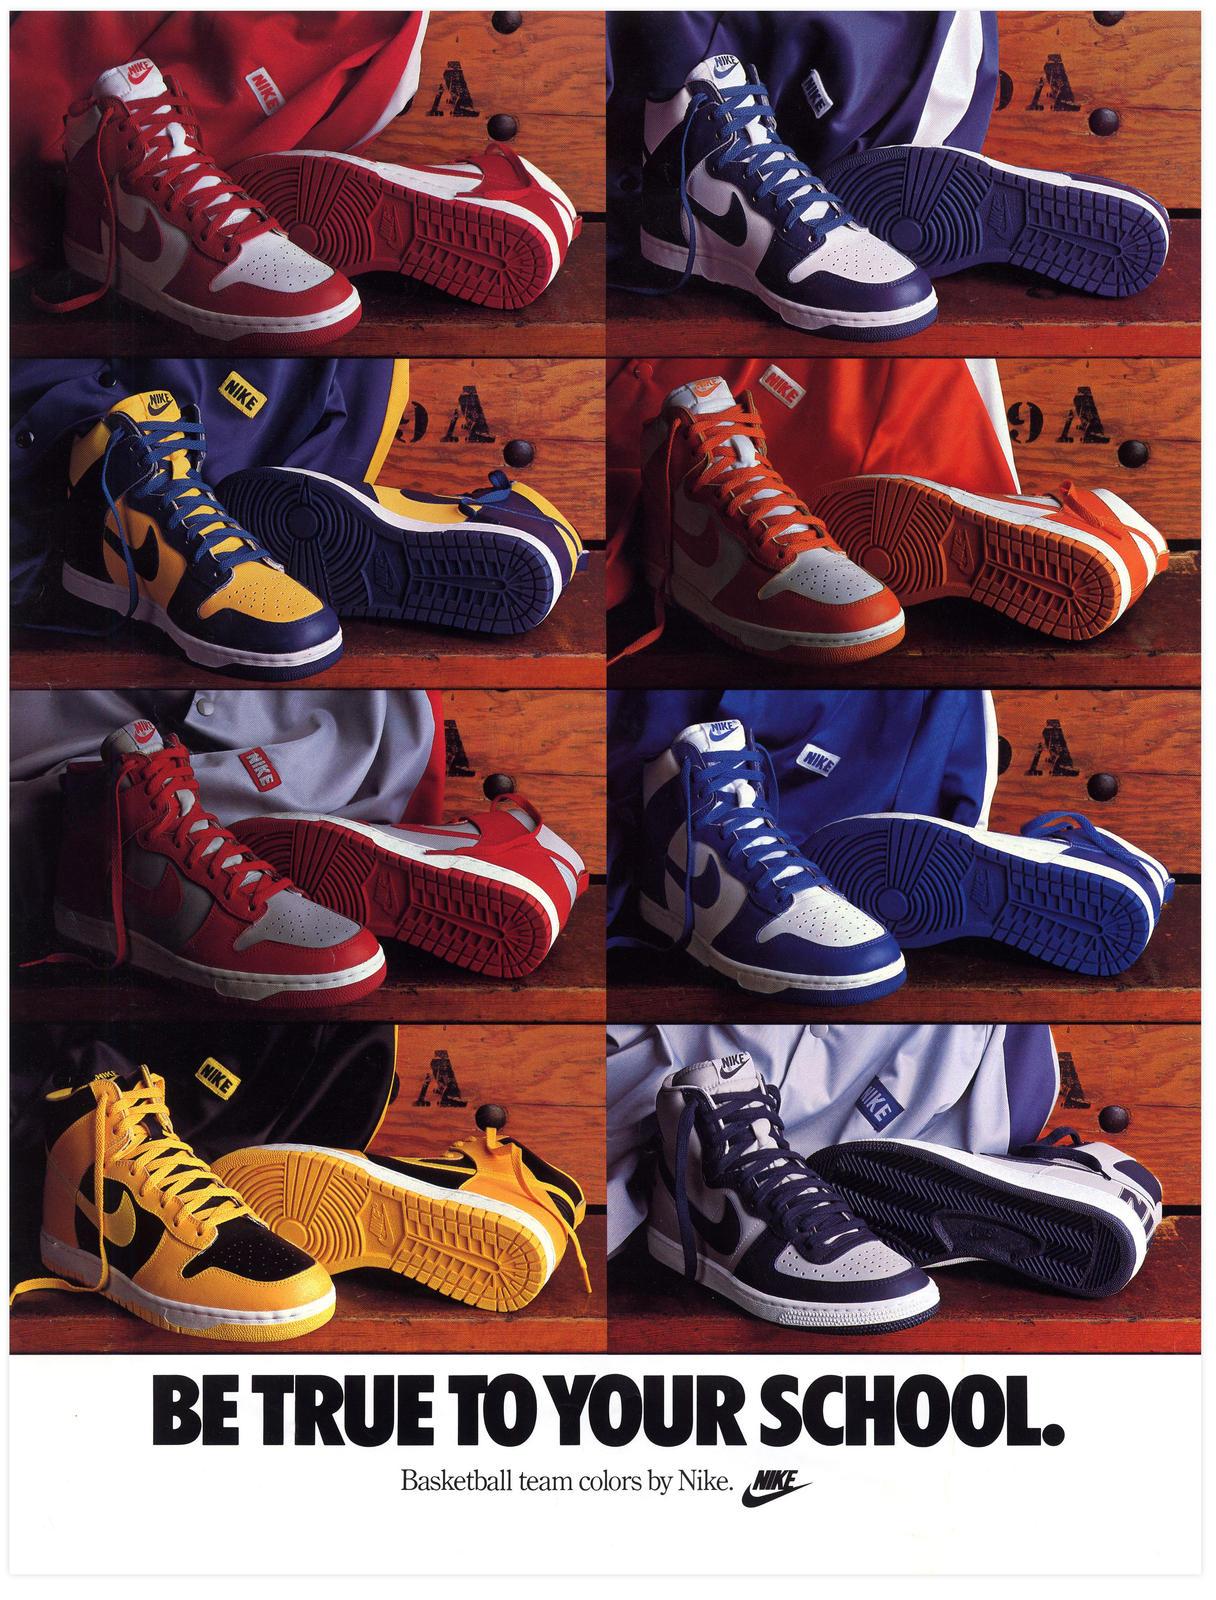 Inside Access: The Nike Dunk Celebrates